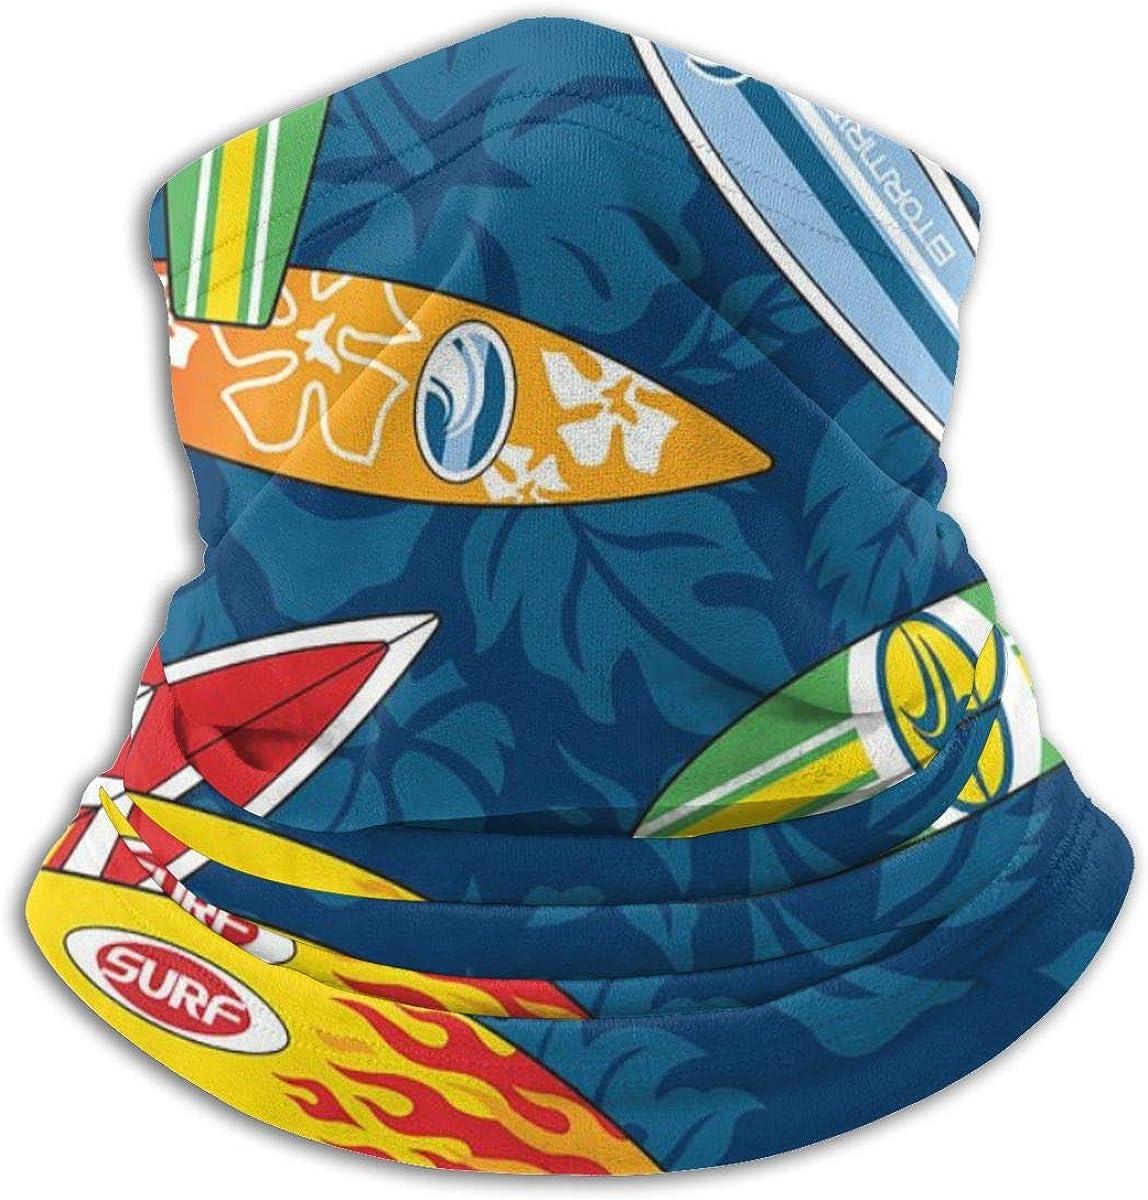 Surfboard Hibiscus Pattern Seamless Neck Warmer Gaiter For Men Women Headband Face Mask Bandana Head Wrap Scarf Headwear Winter Balaclava For Ski Running Motorcycle